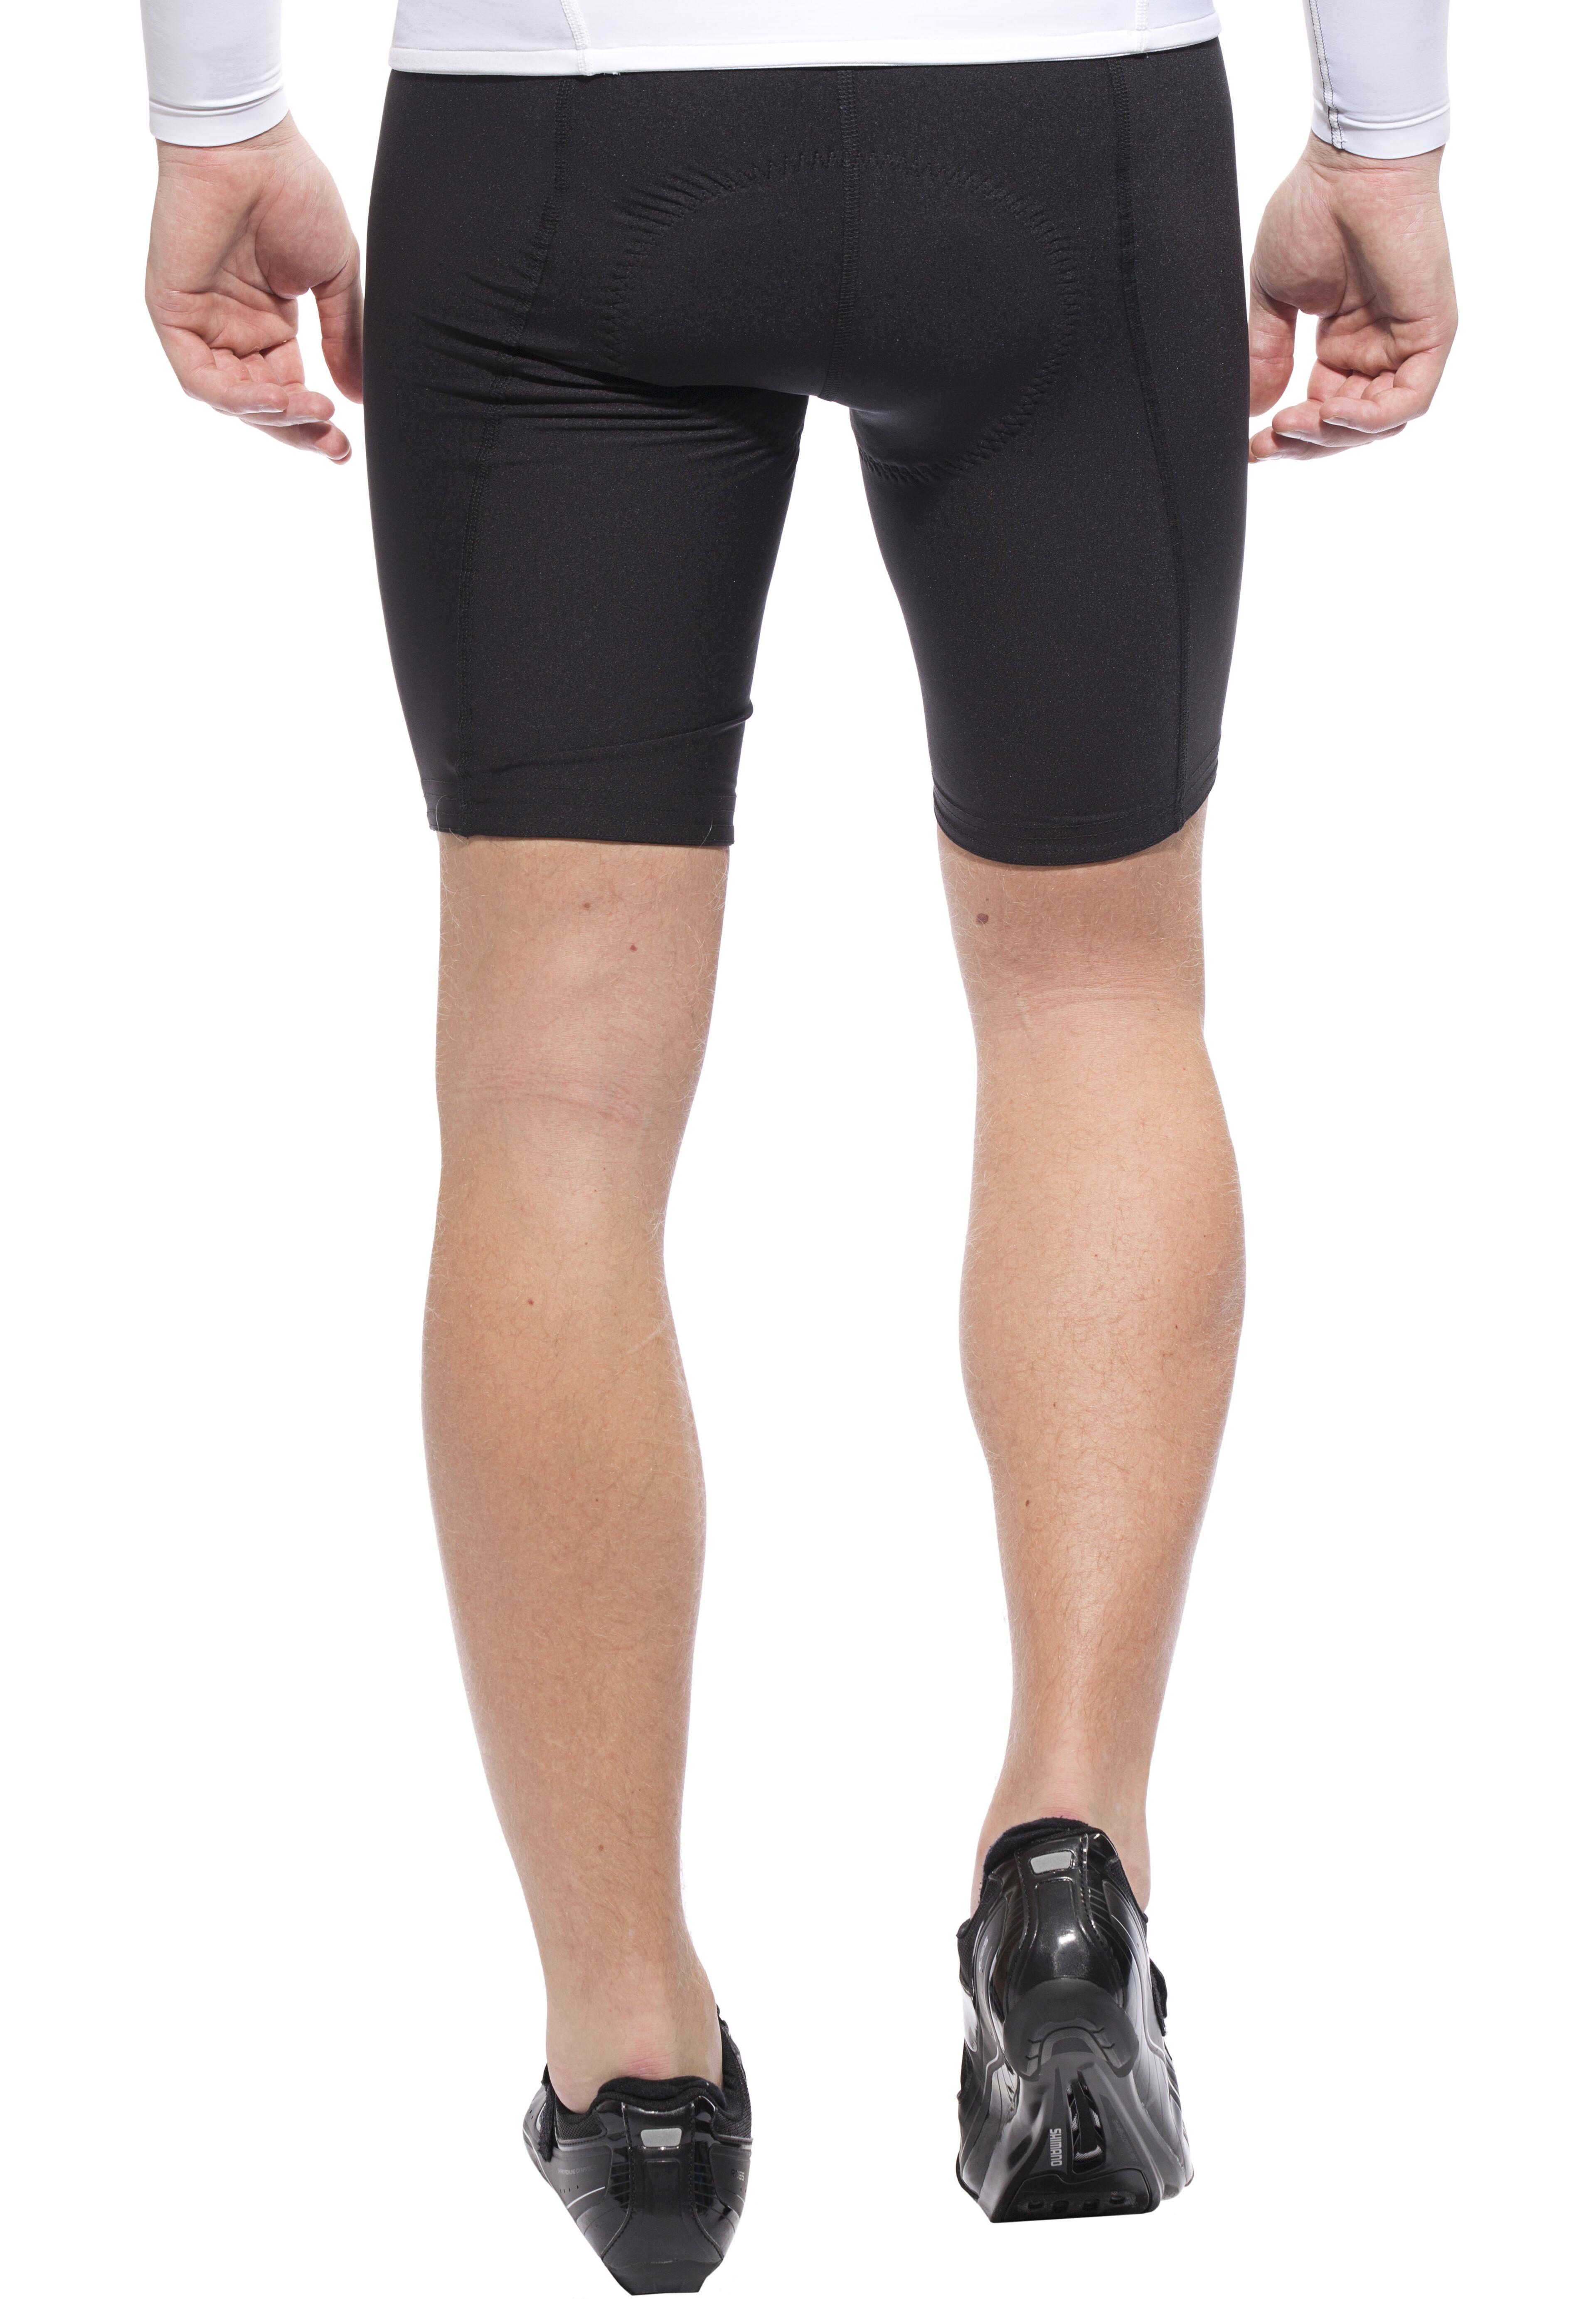 adf2137716 Löffler Basic - Culotte corto sin tirantes Hombre - negro